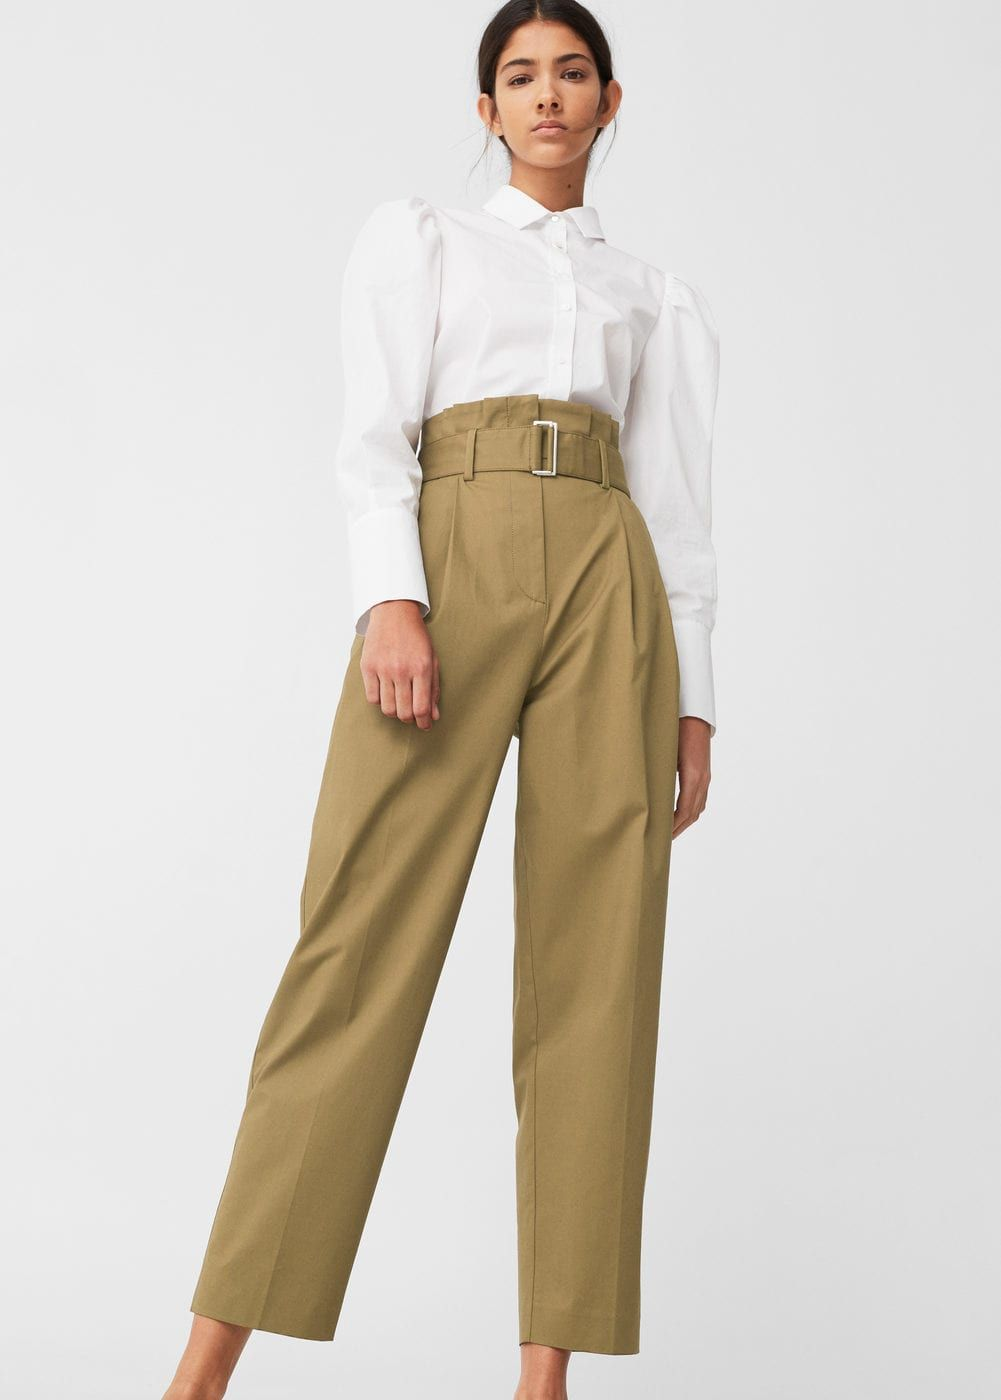 Pantalón cintura alta - Pantalones de Mujer  eb41f14558d